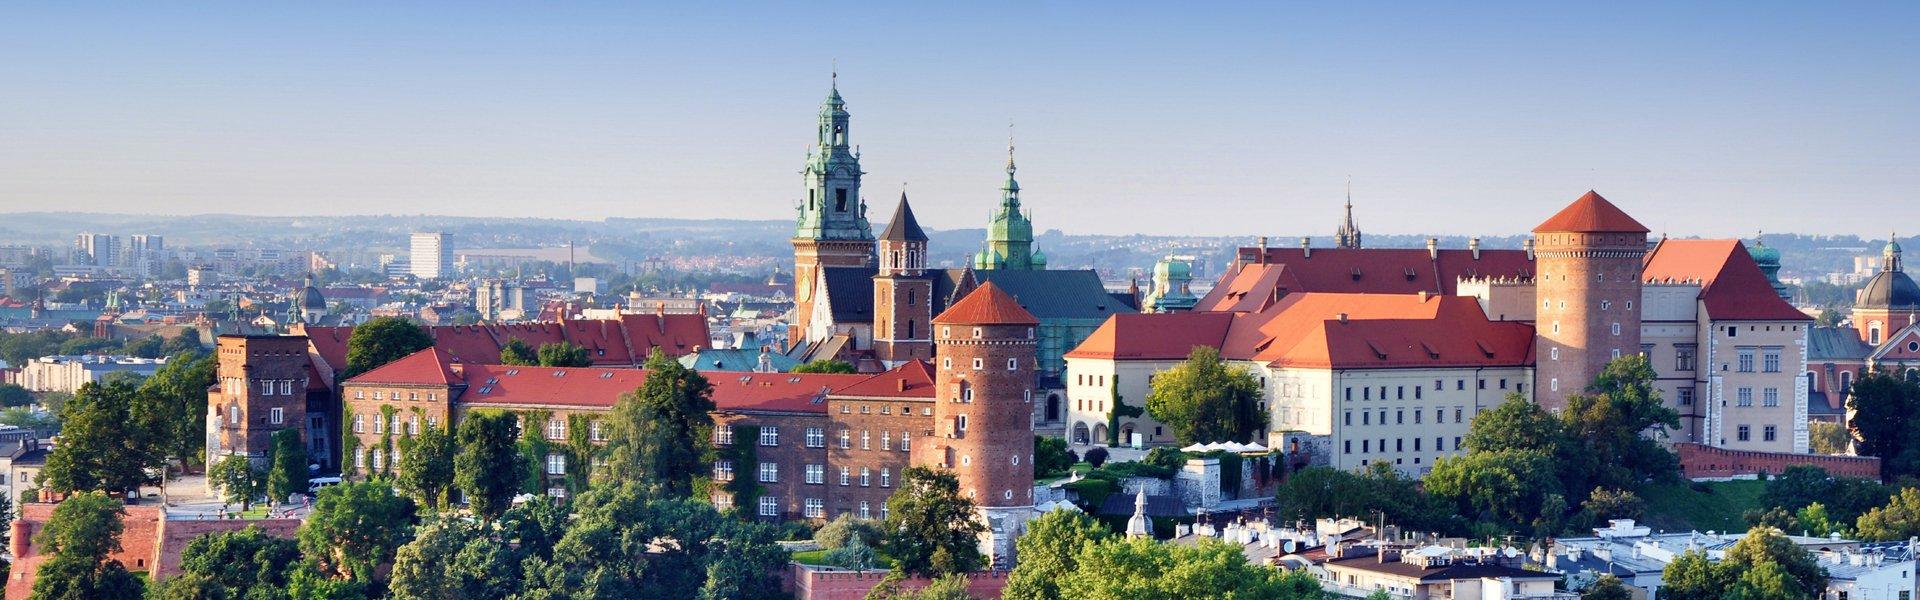 Krakau, Polen